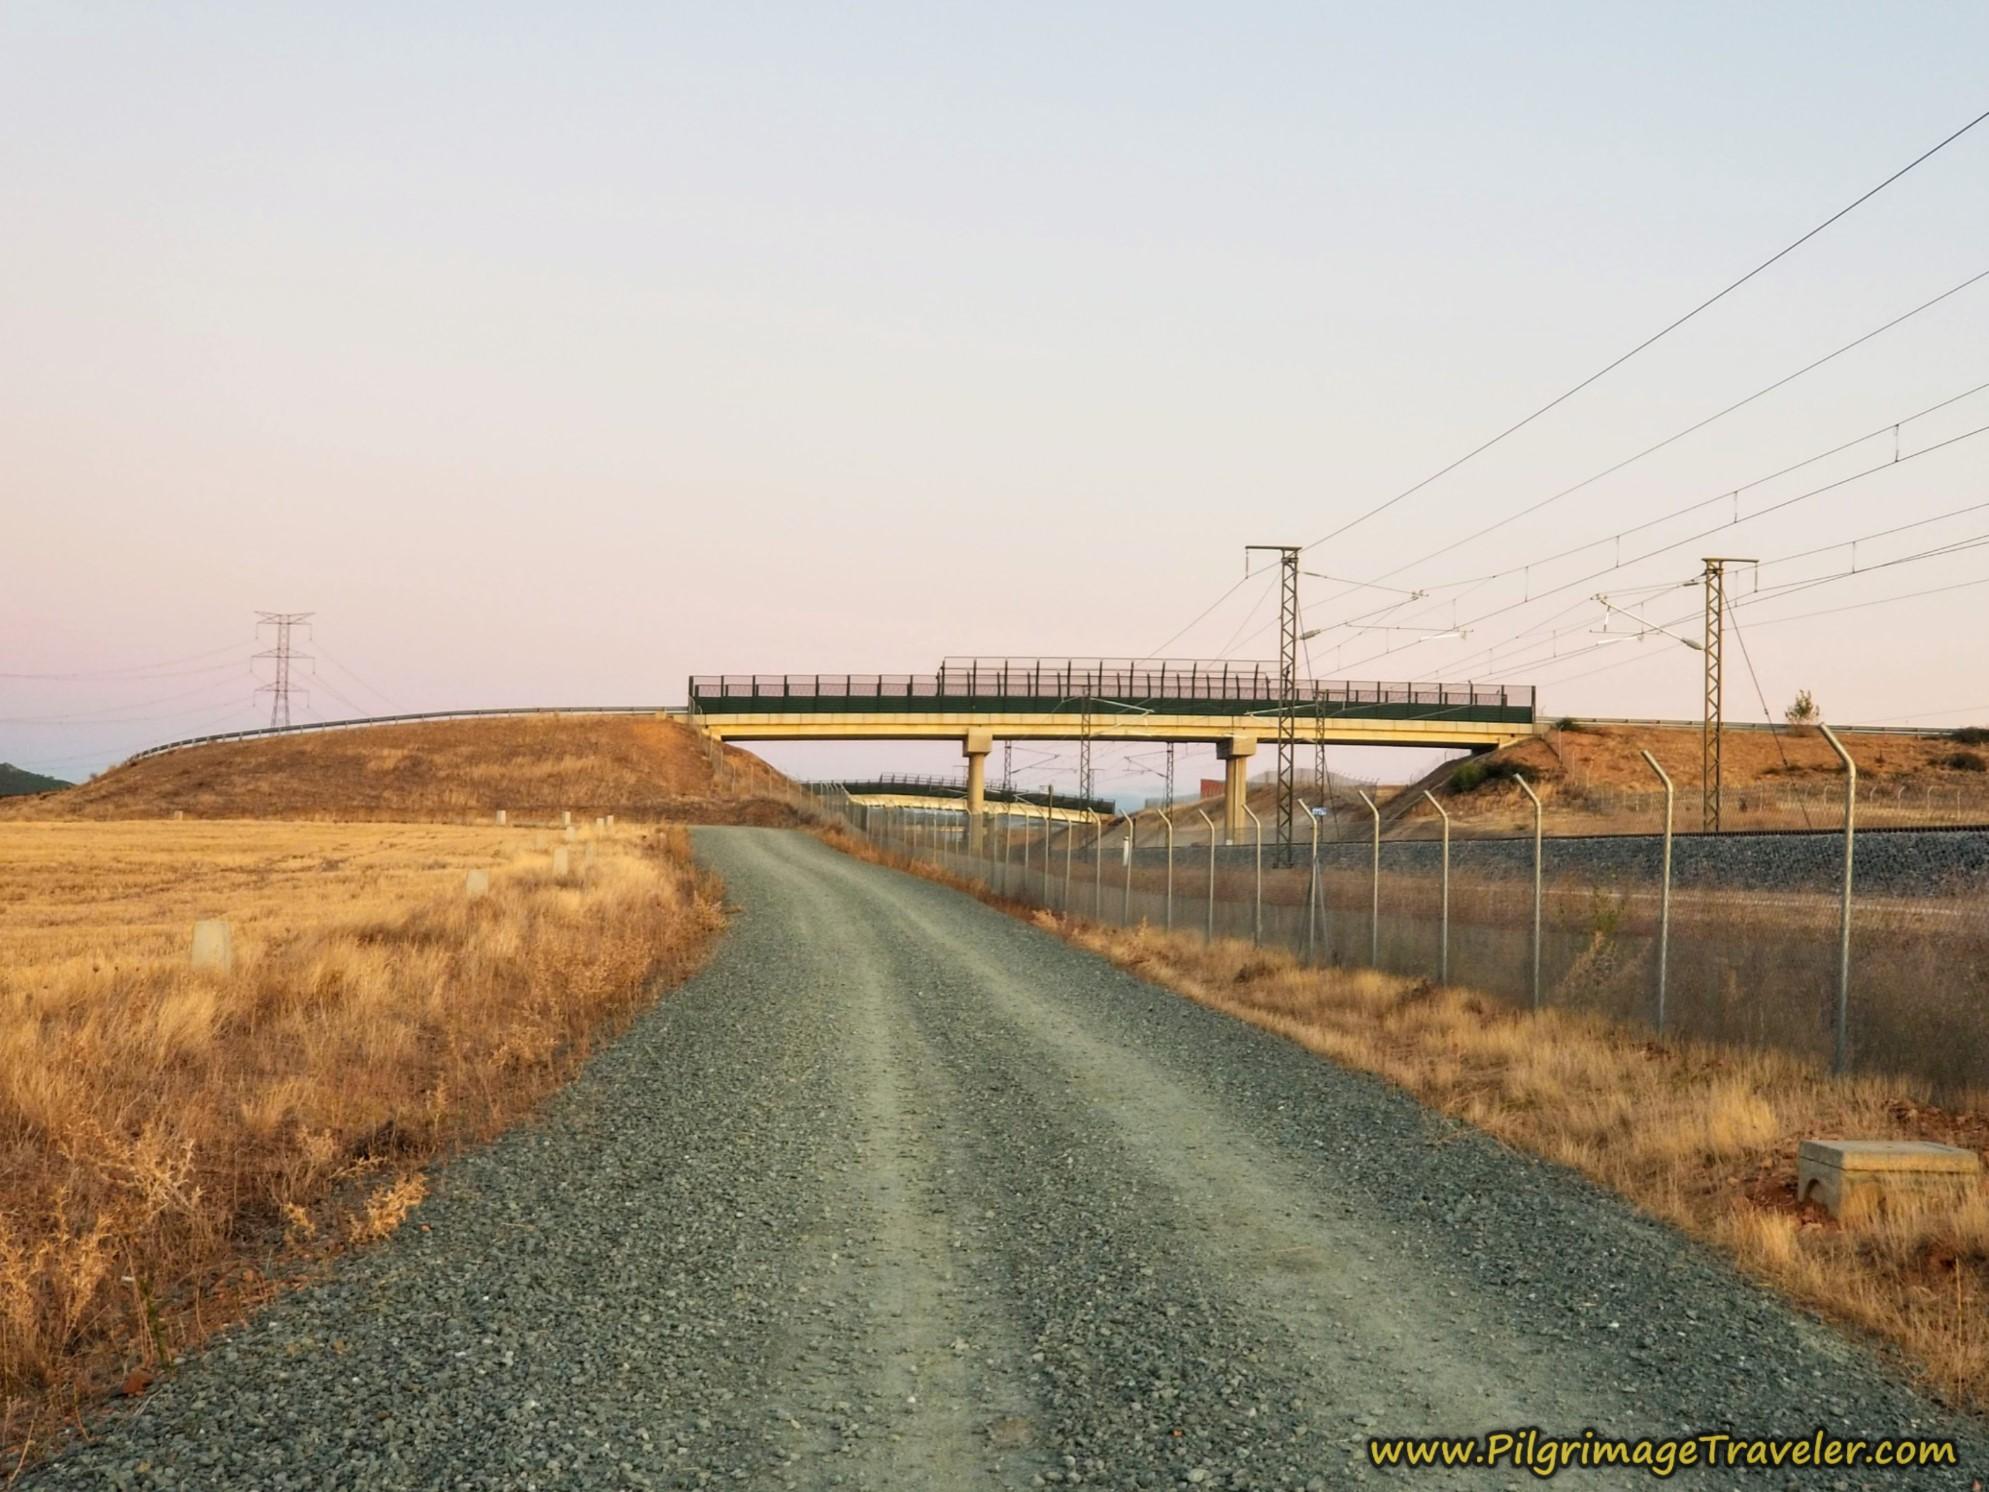 First Railroad Bridge in View